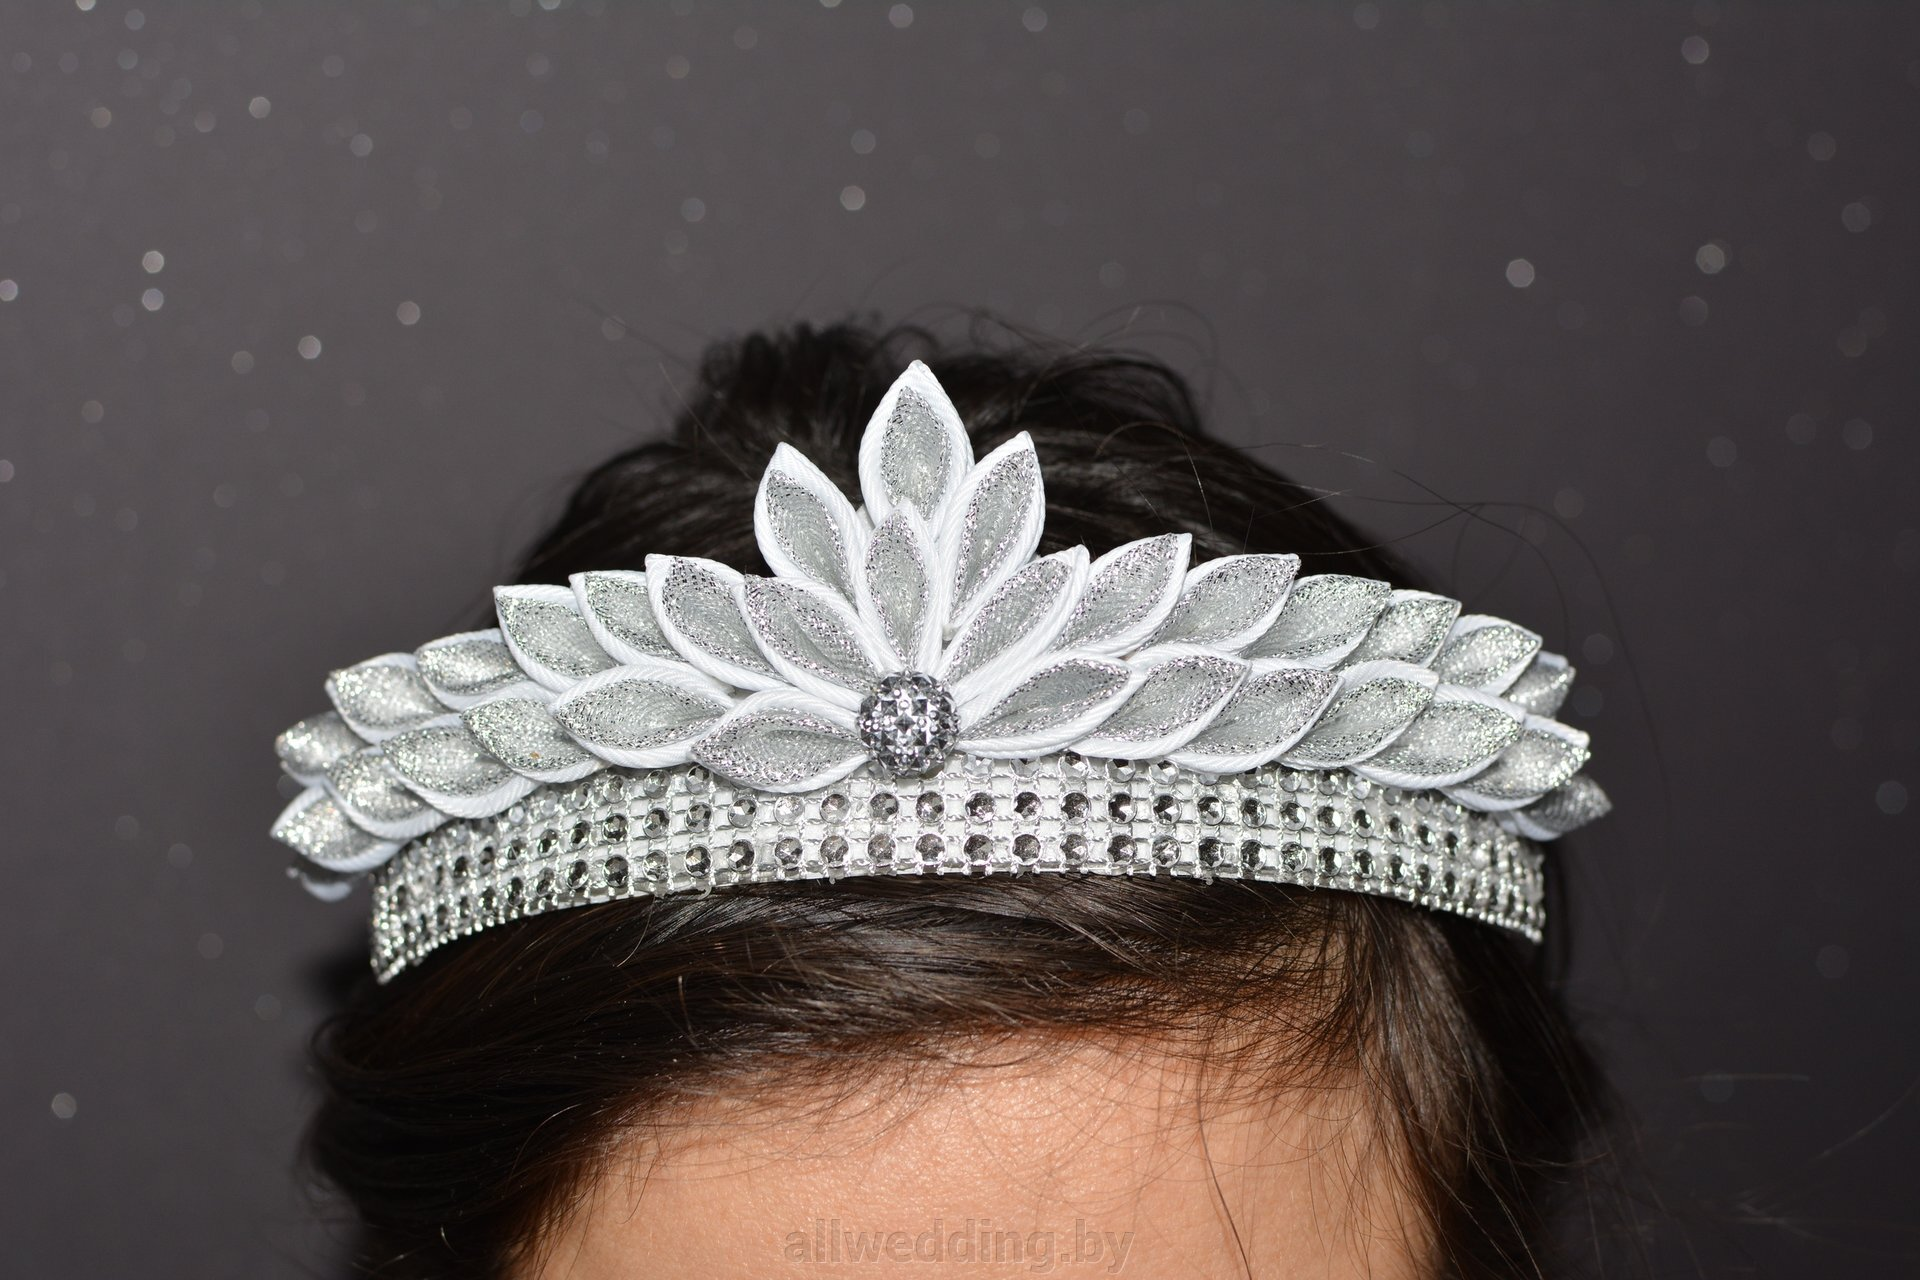 Новогодняя корона от мастера ЕкатеринаУспех - фото pic_48501a63f1d7603_1920x9000_1.jpg